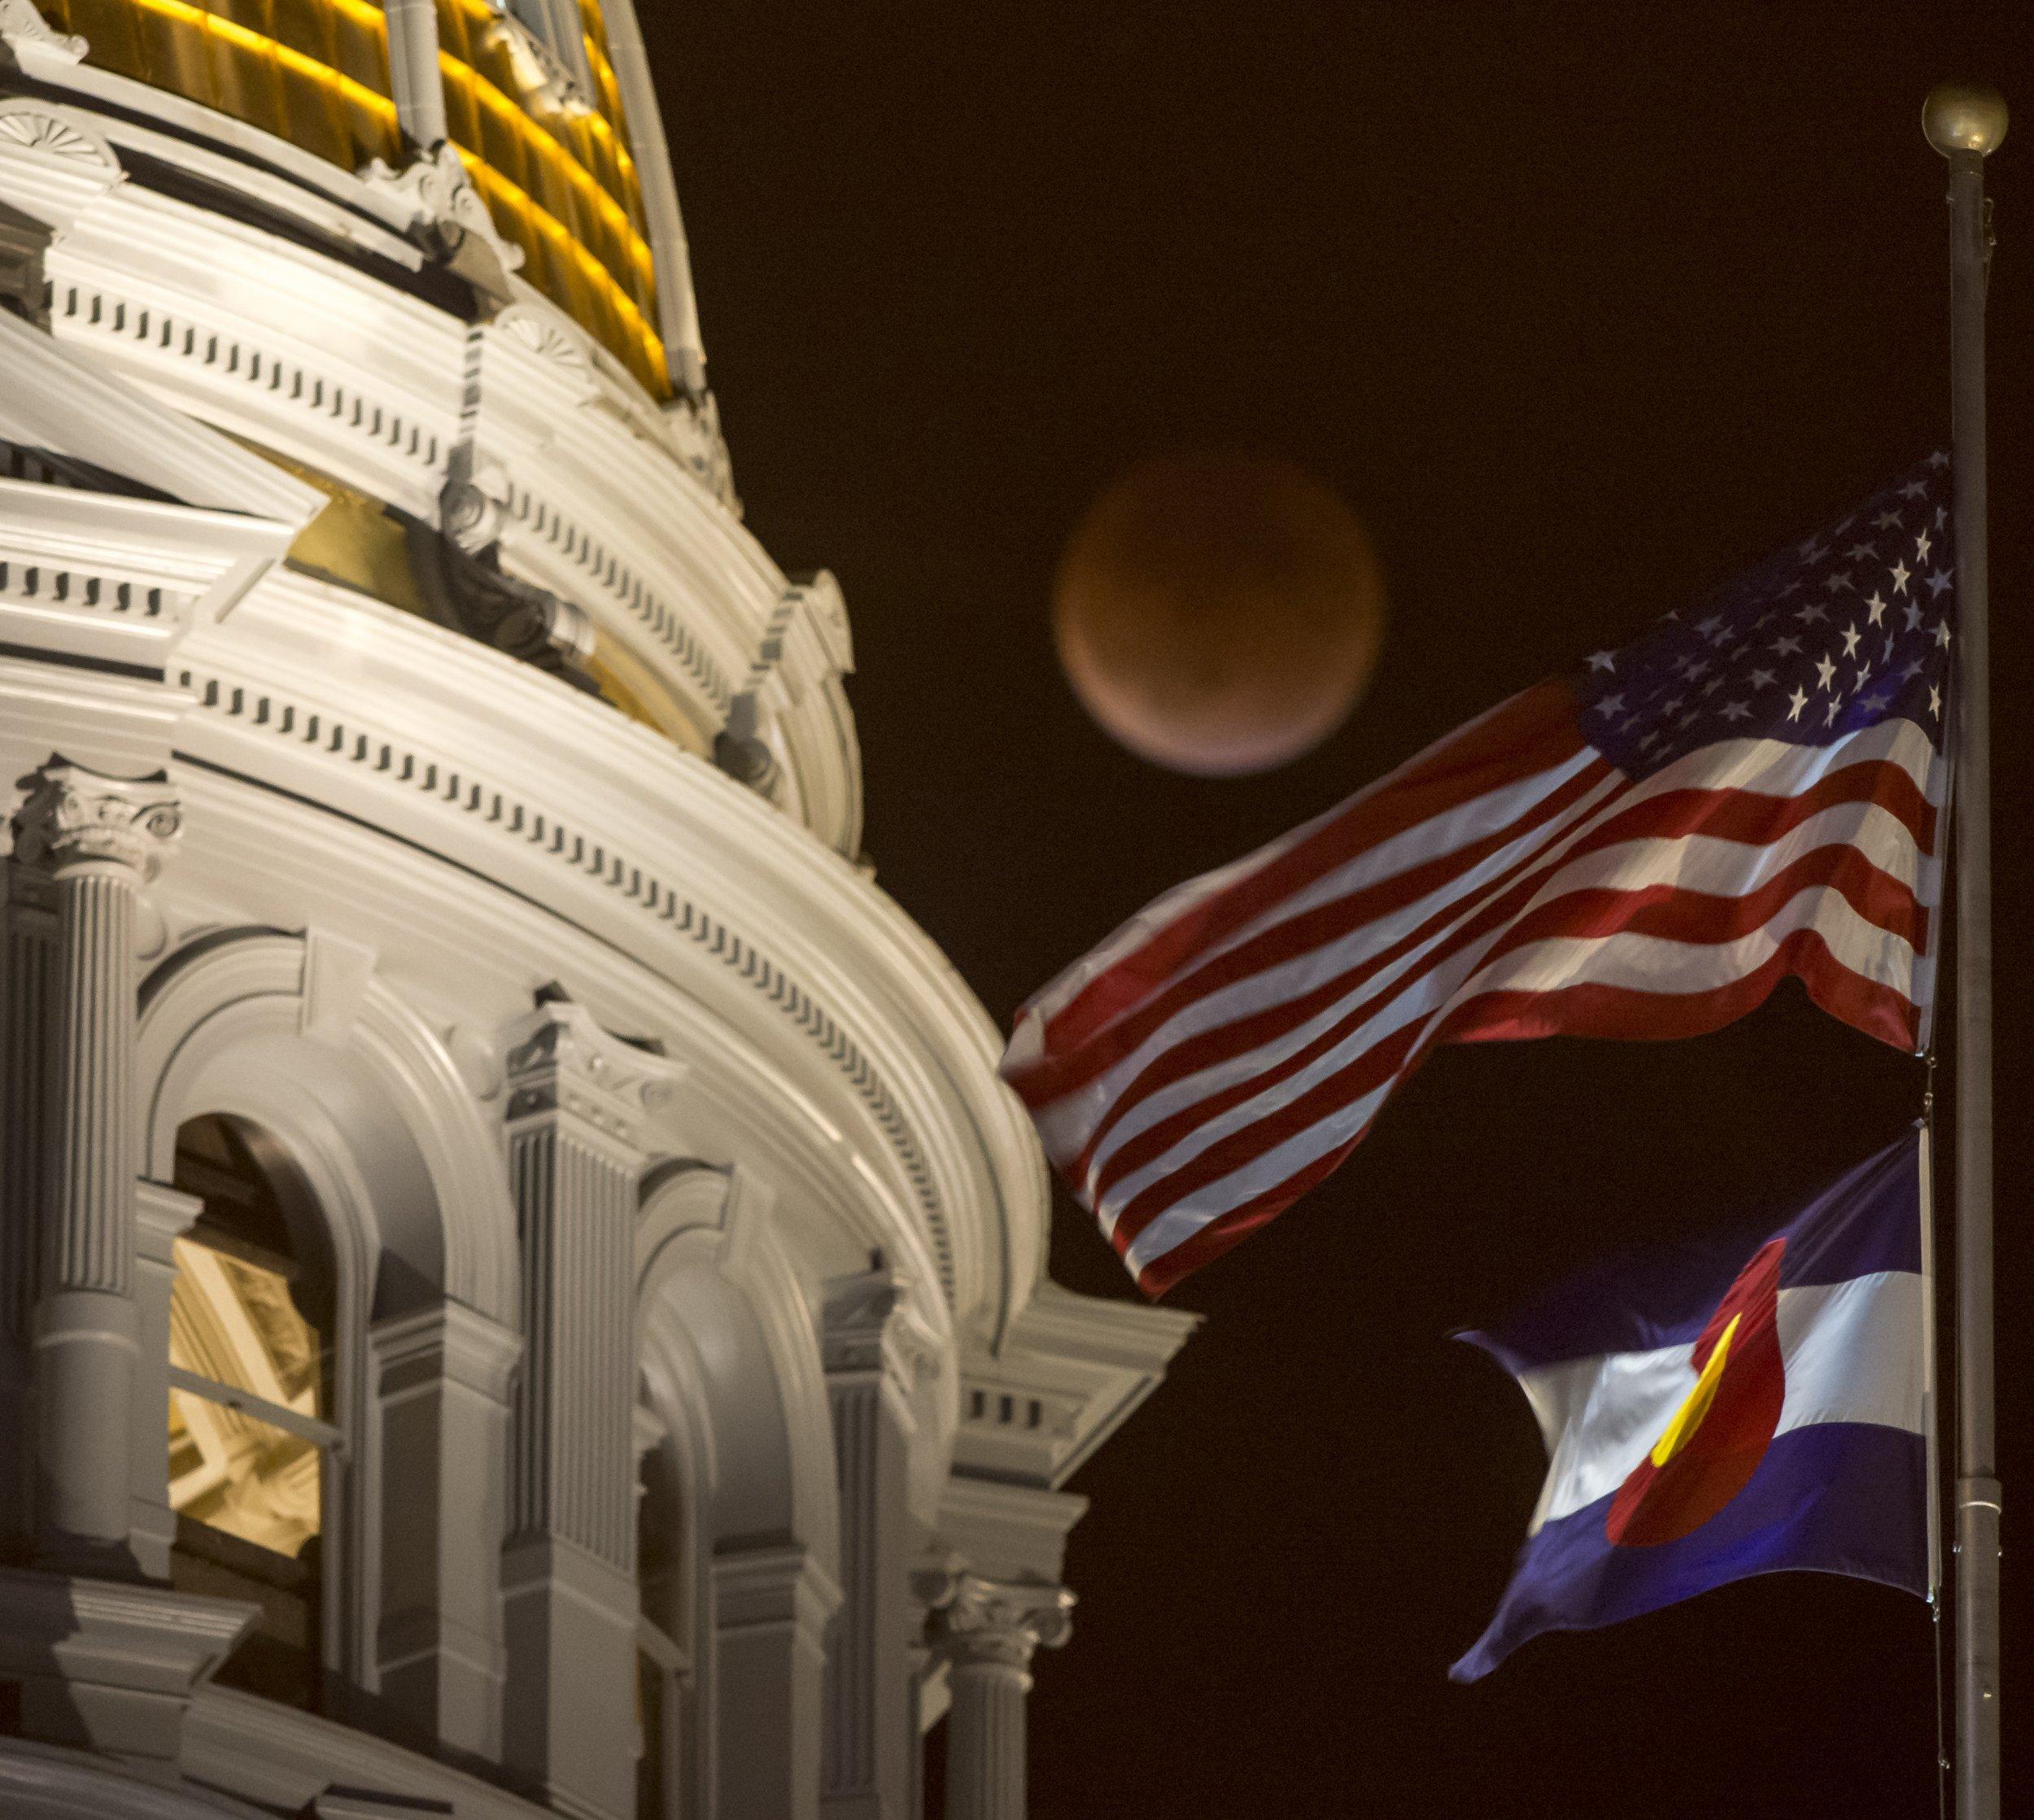 blood moon 2019 denver - photo #33